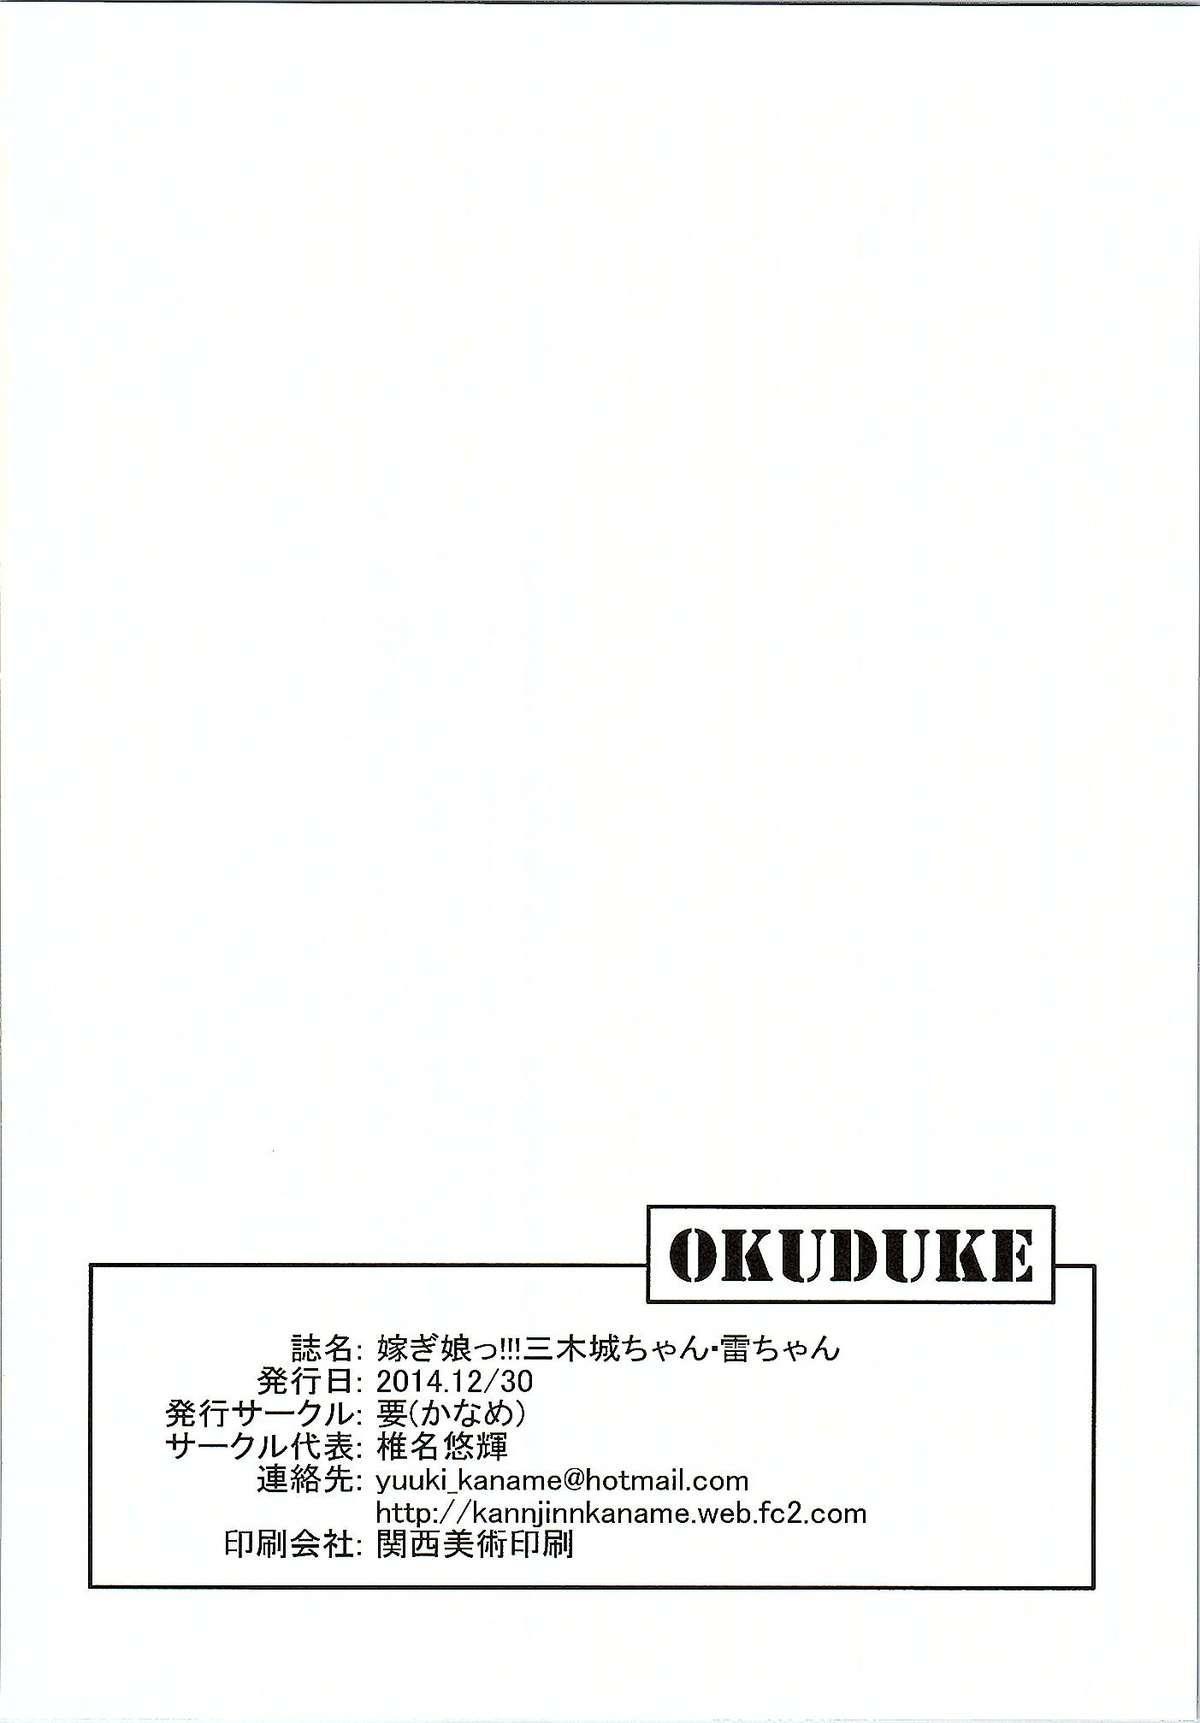 (C87) [Kaname (Siina Yuuki)] Totsugiko!!! Mikishiro-chan Ikazuchi-chan (Oshiro Project ~CASTLE DEFENSE~, Kantai Collection -KanColle-) 18